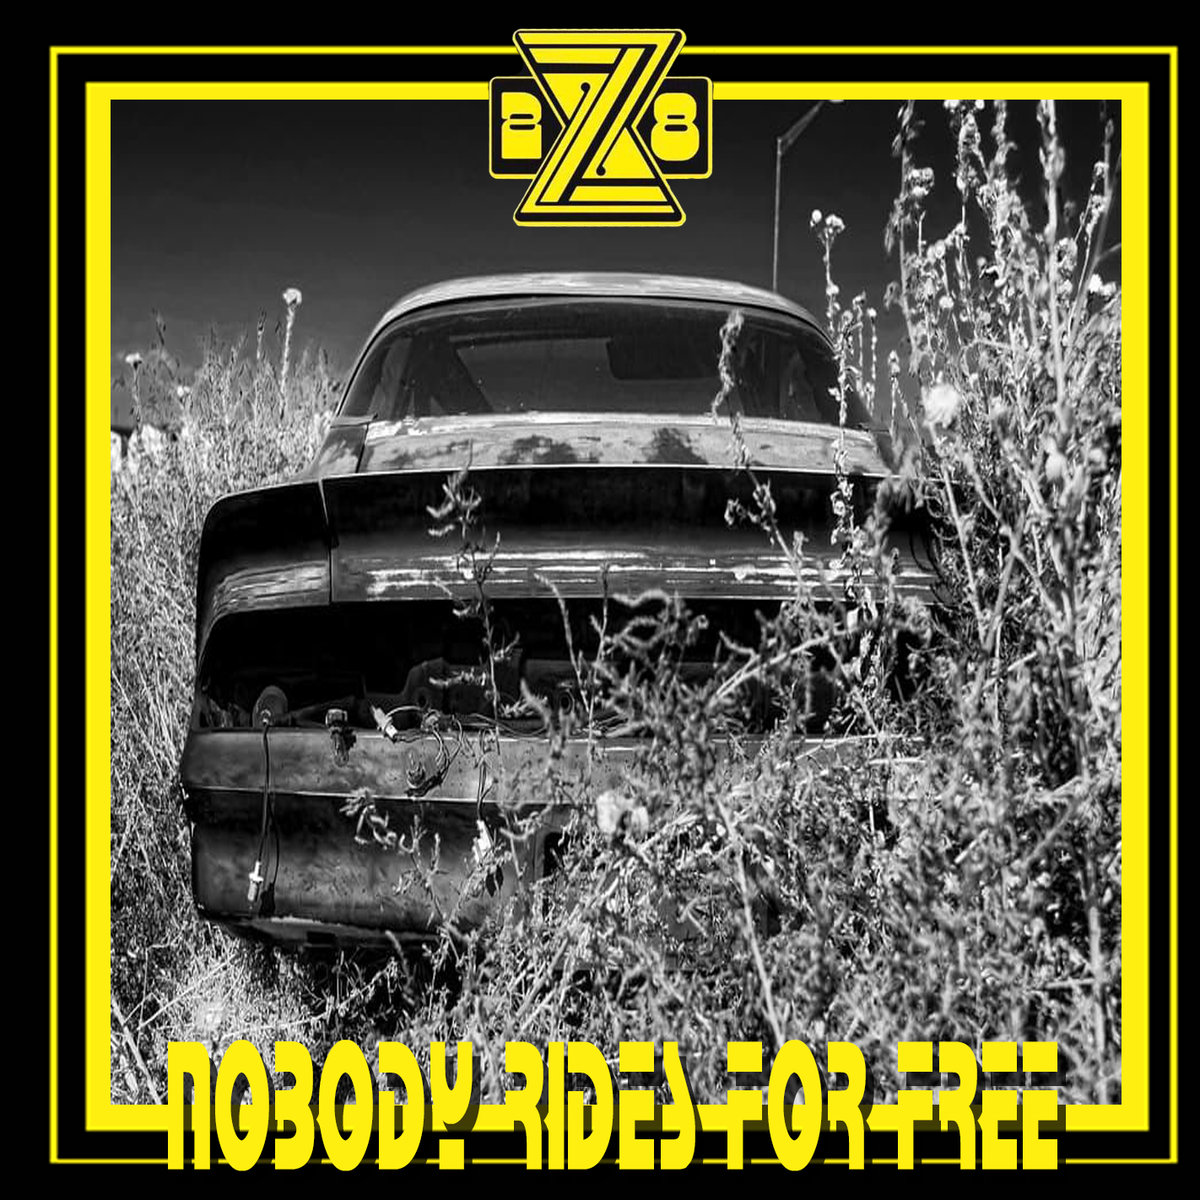 z28 nobody rides for free